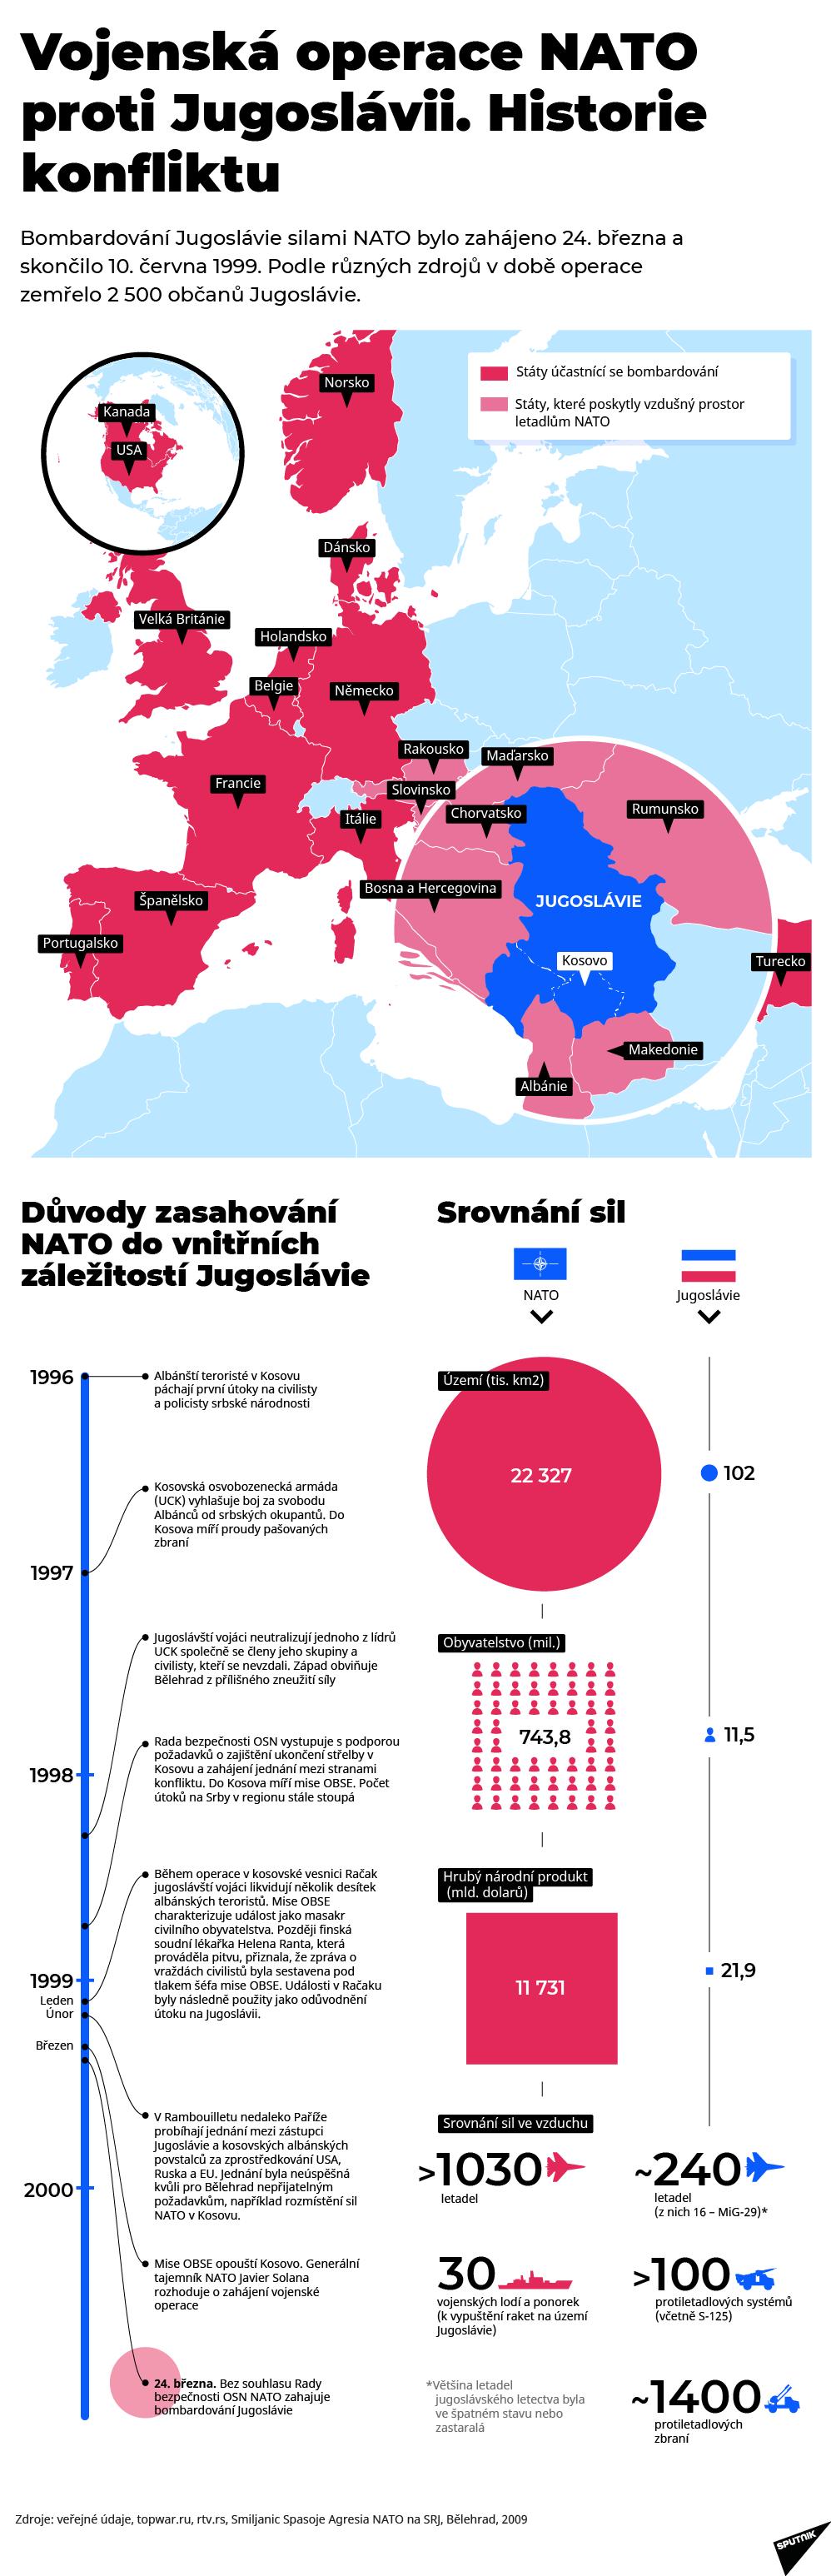 Operace NATO proti Jugoslávii